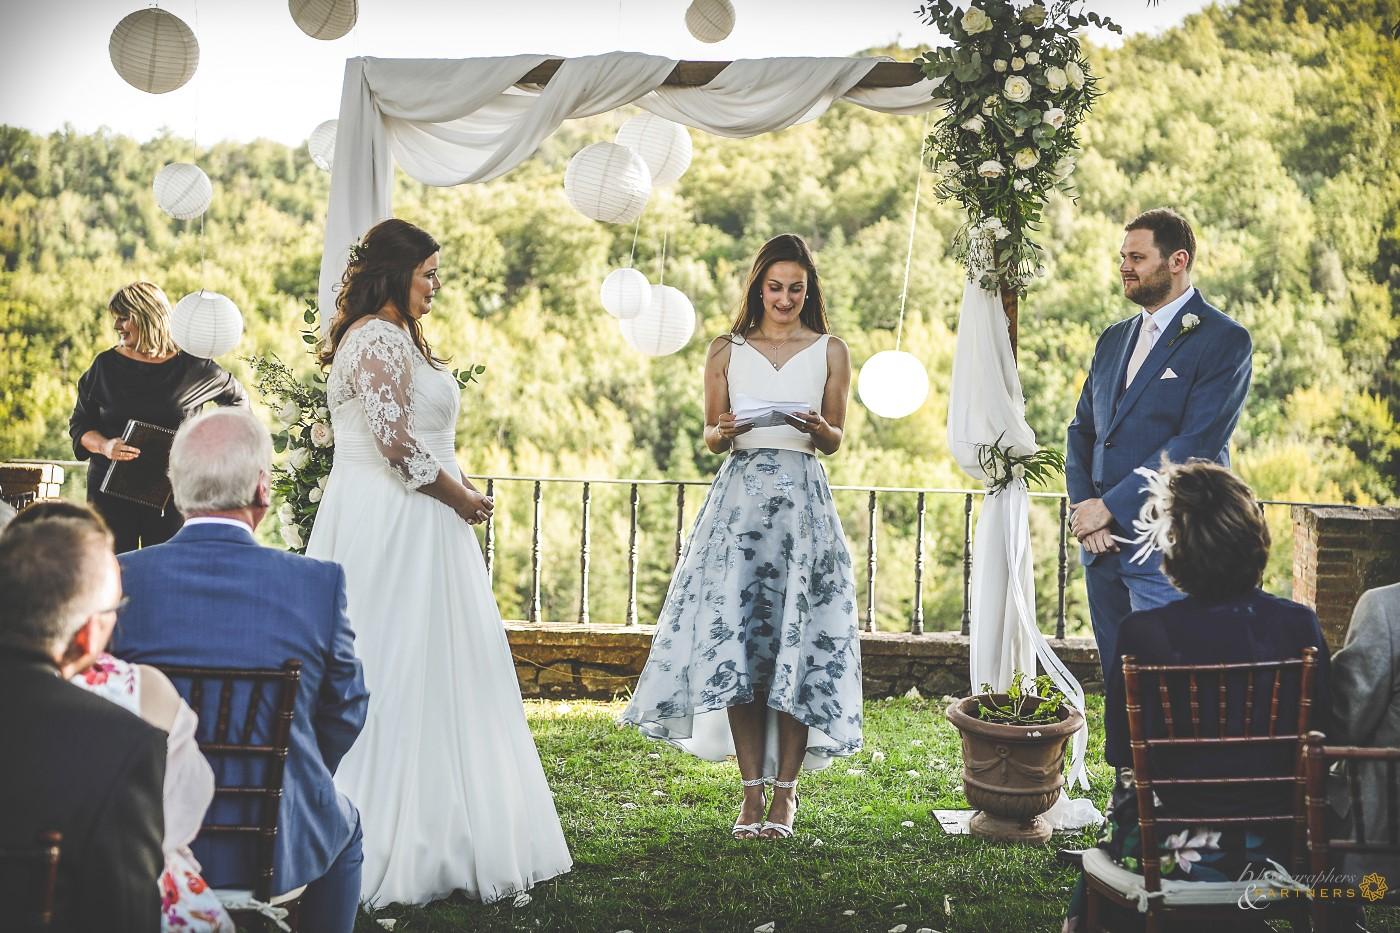 wedding_photos_villa_dievole_07.jpg